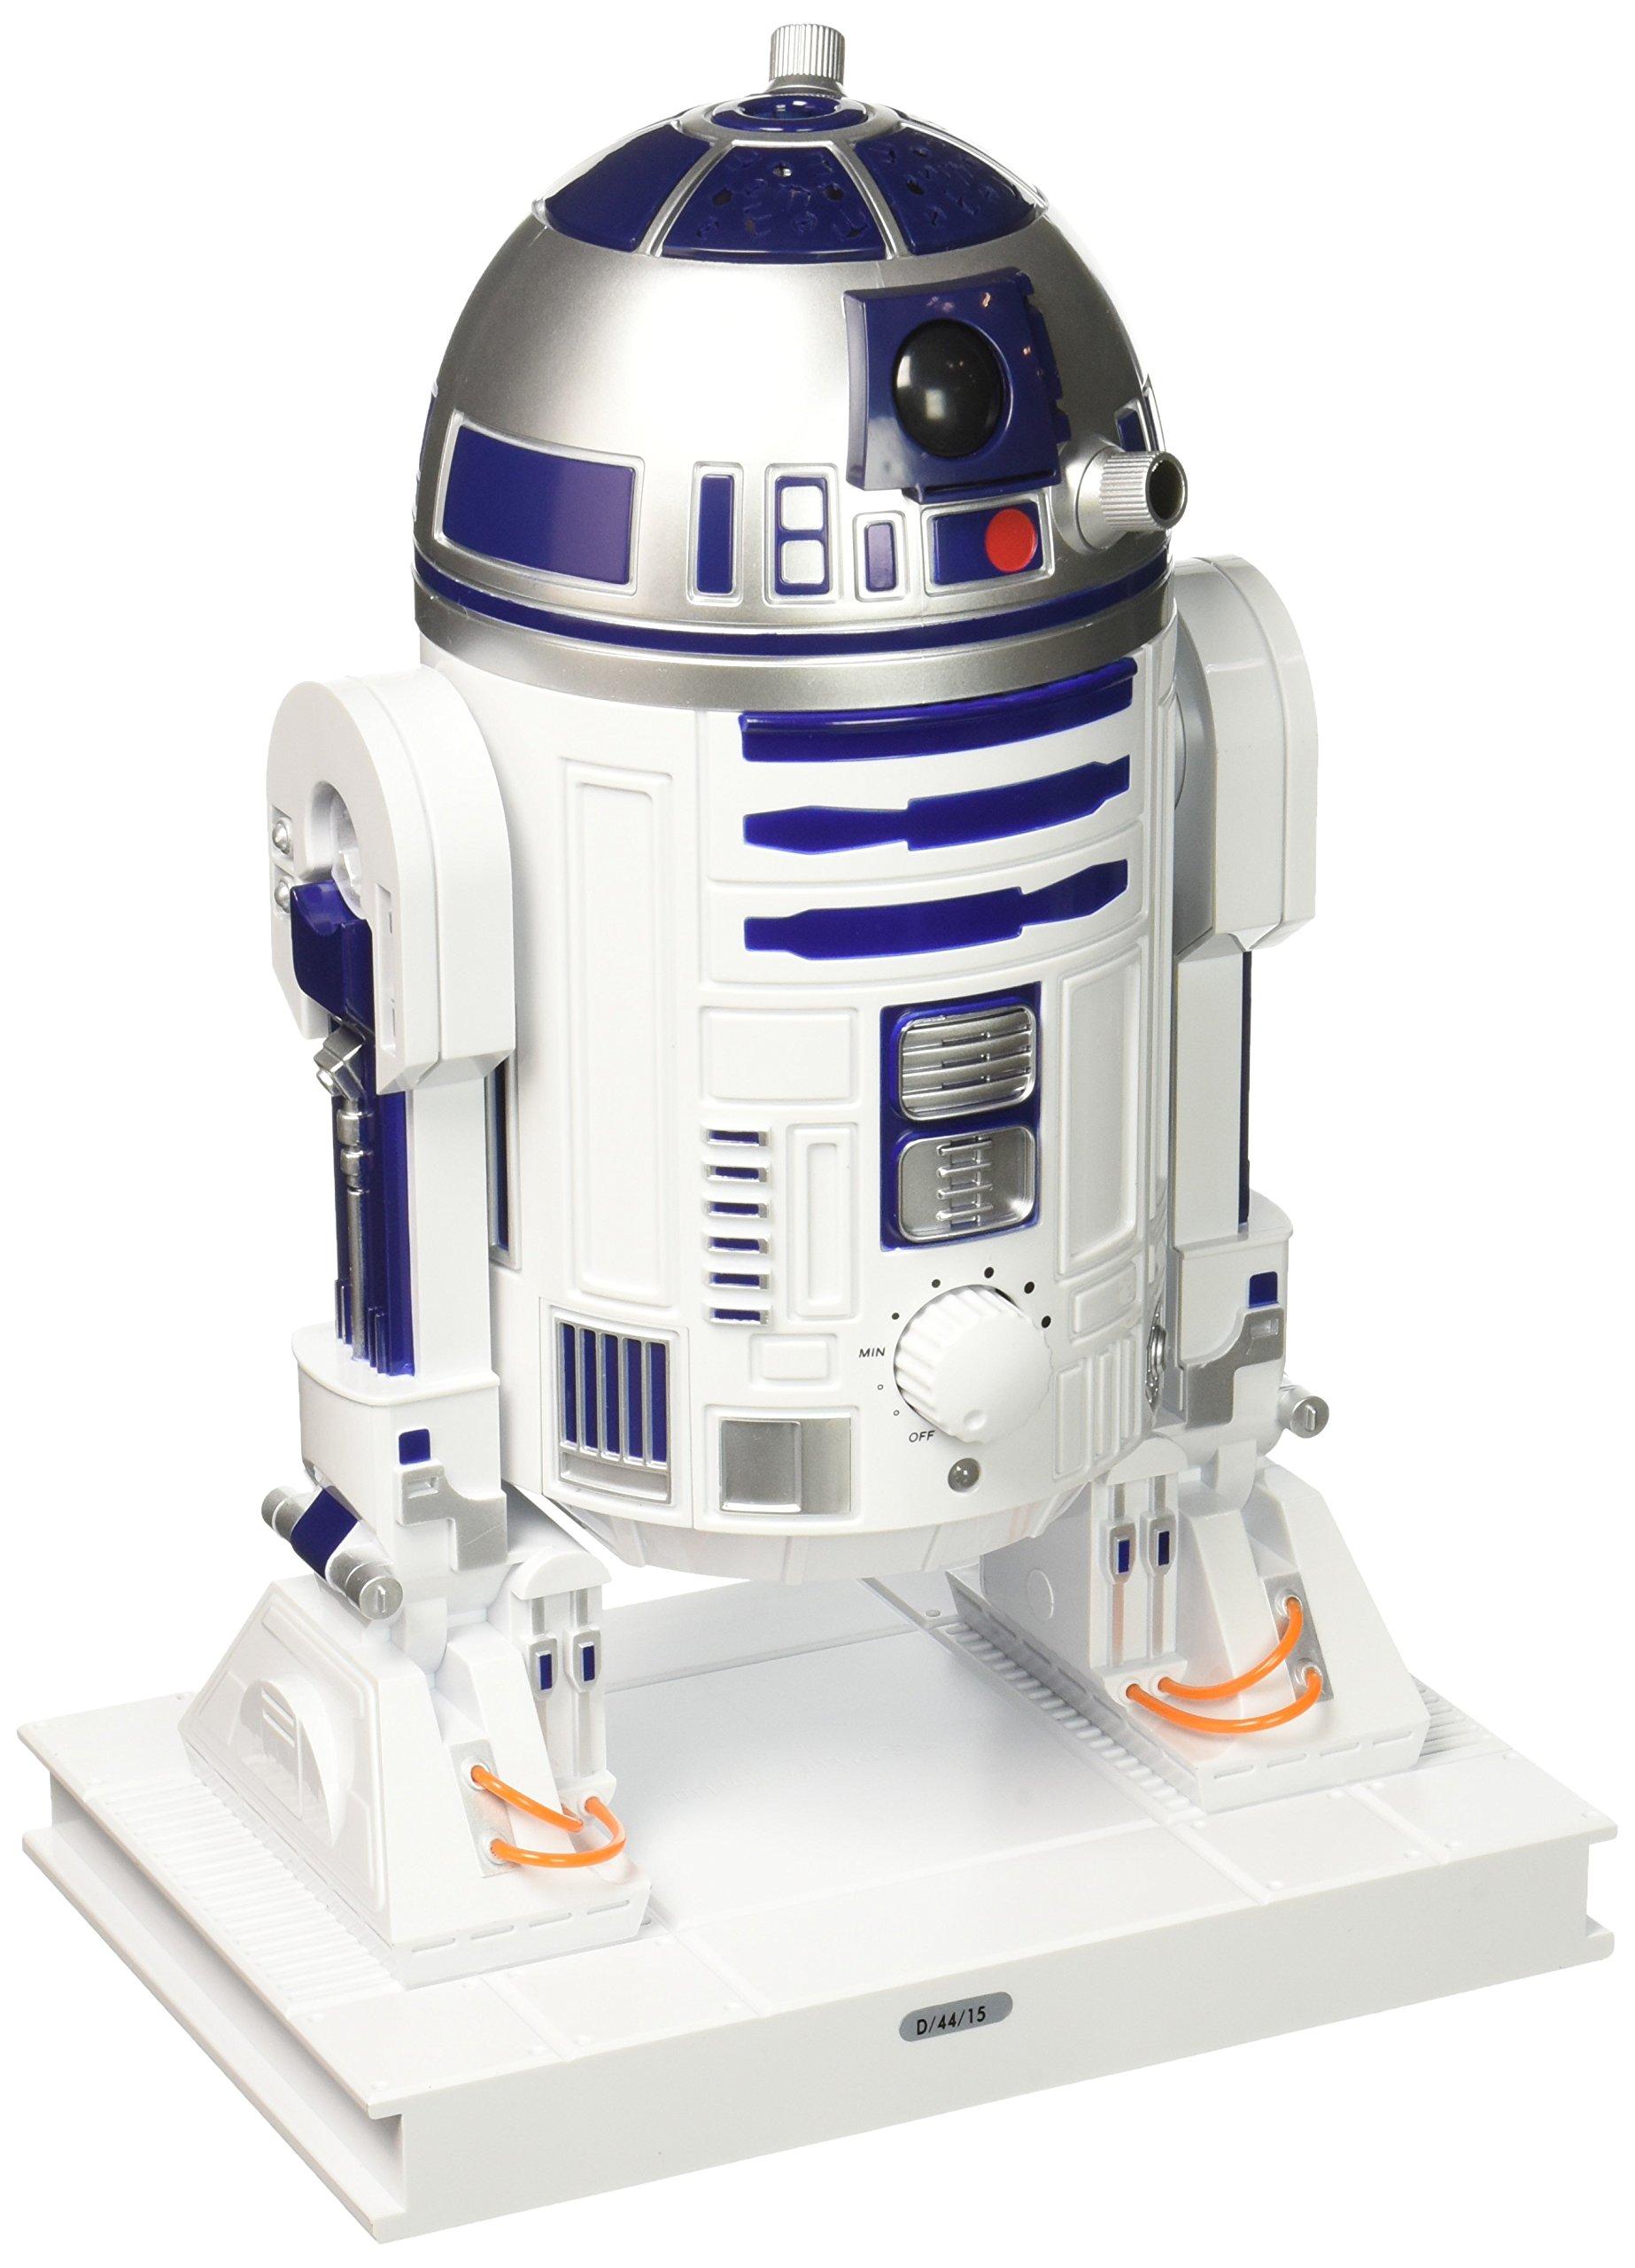 Star Wars R2D2 Ultrasonic Cool Mist Personal Humidifier, 7.8''